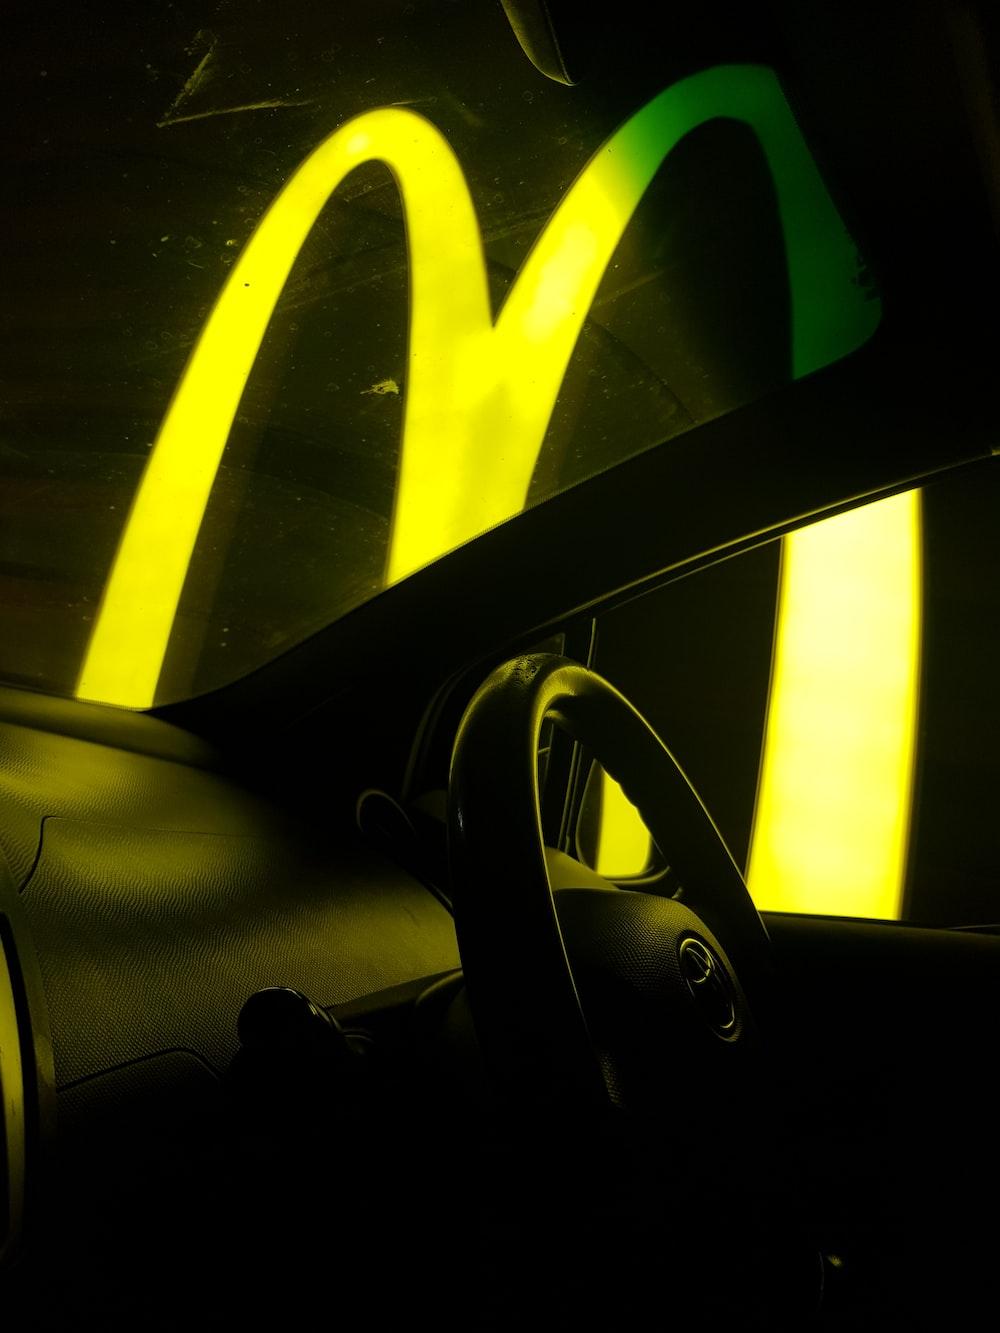 McDonalds neon sign